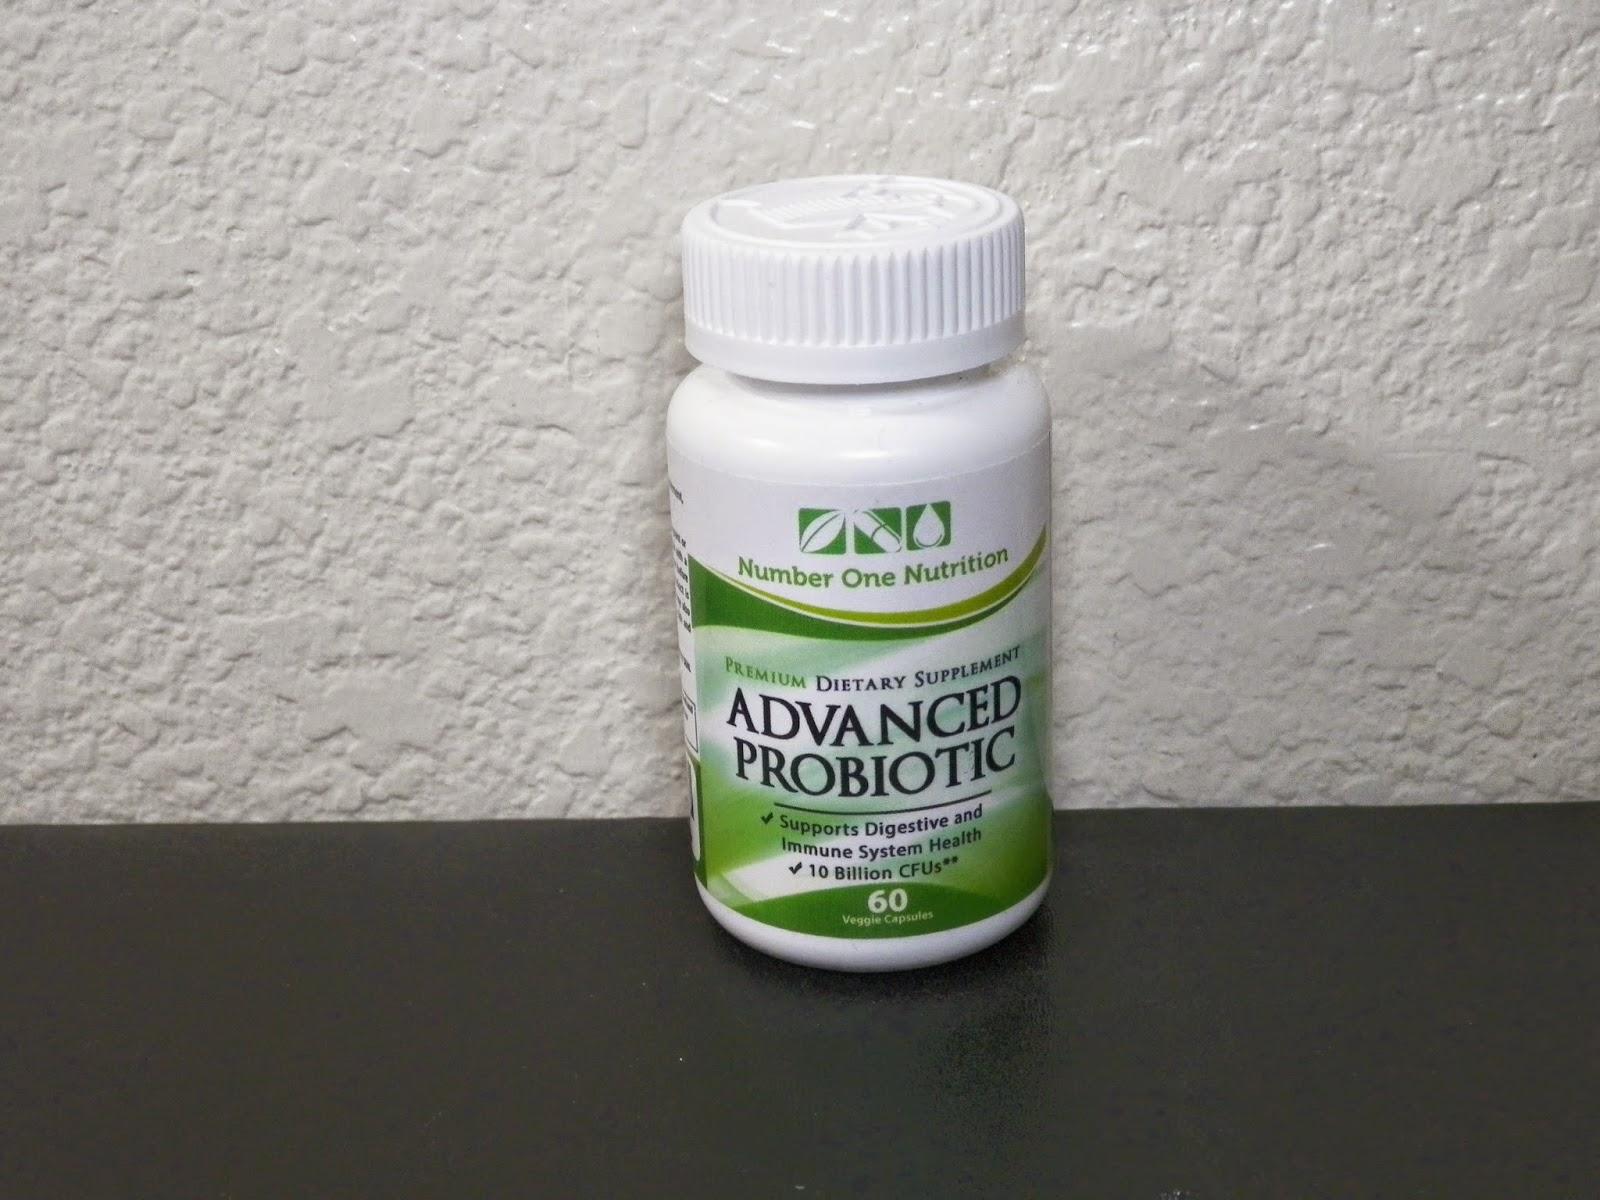 AdvancedProbioticNumberOneNutrition.jpg